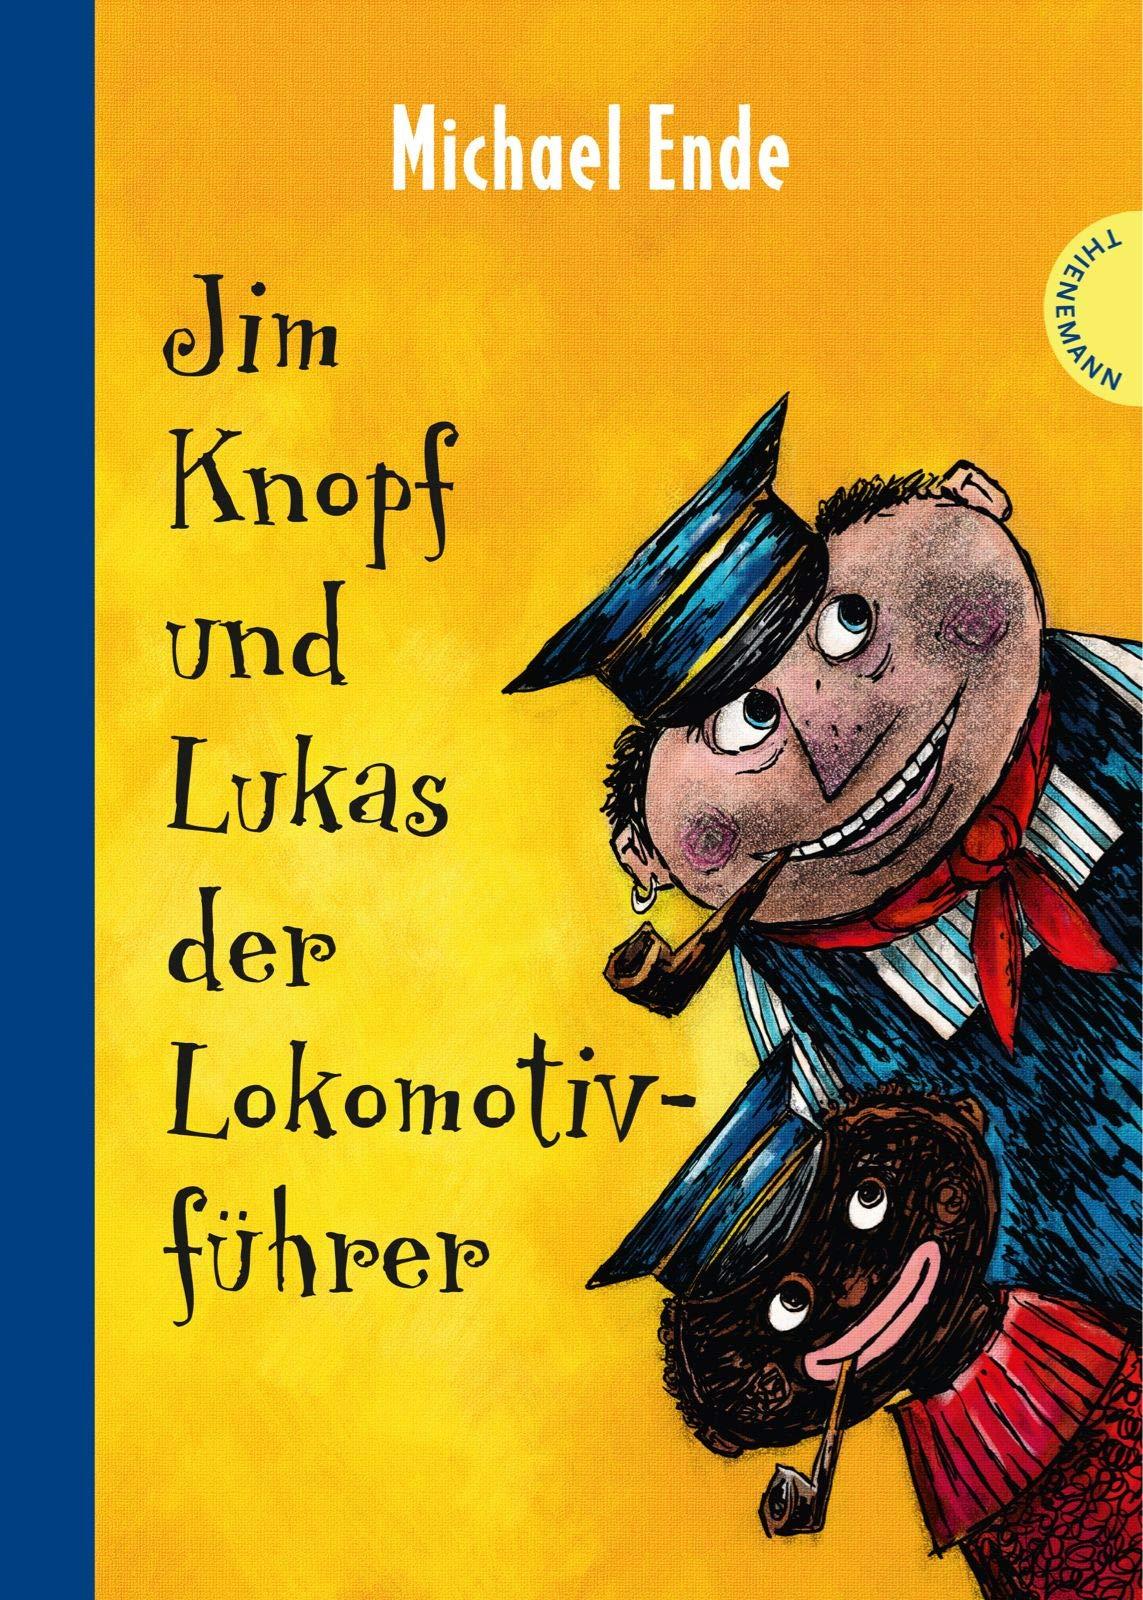 Jim Knopf Und Lukas Der Lokomotivfuhrer Kolorierte Neuausgabe Amazon De Ende Michael Tripp F J Weber Mathias Bucher